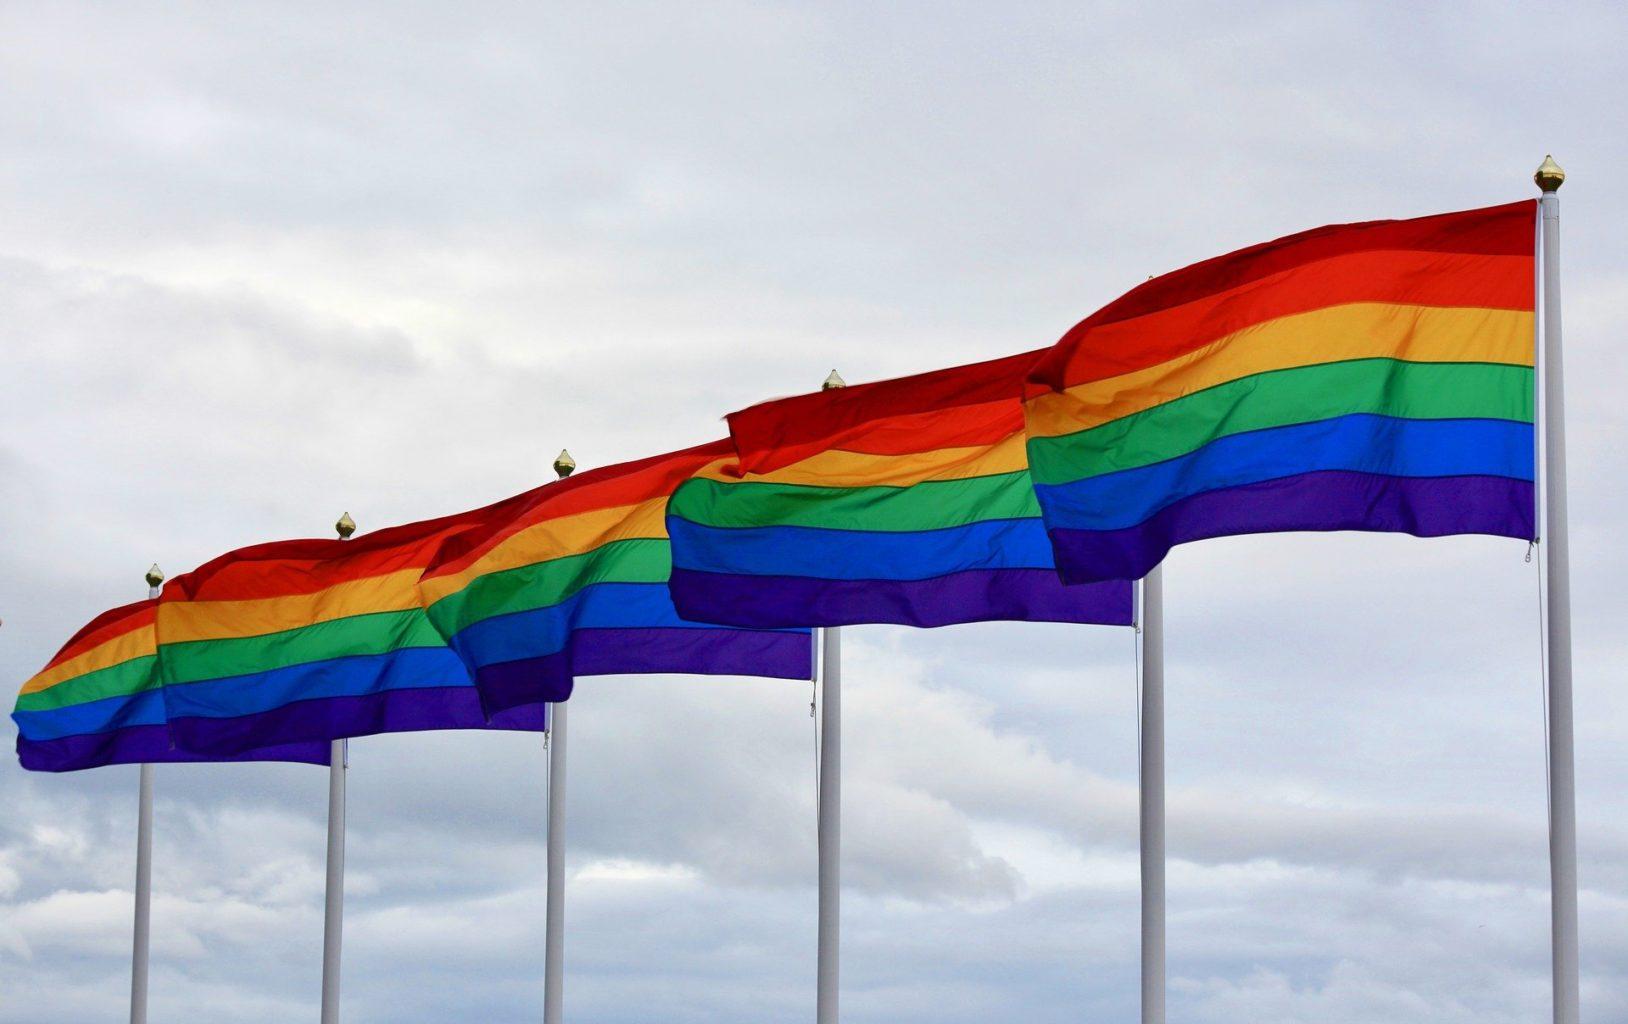 Флаг ЛГБТ вывесят над зданием Госдепа США